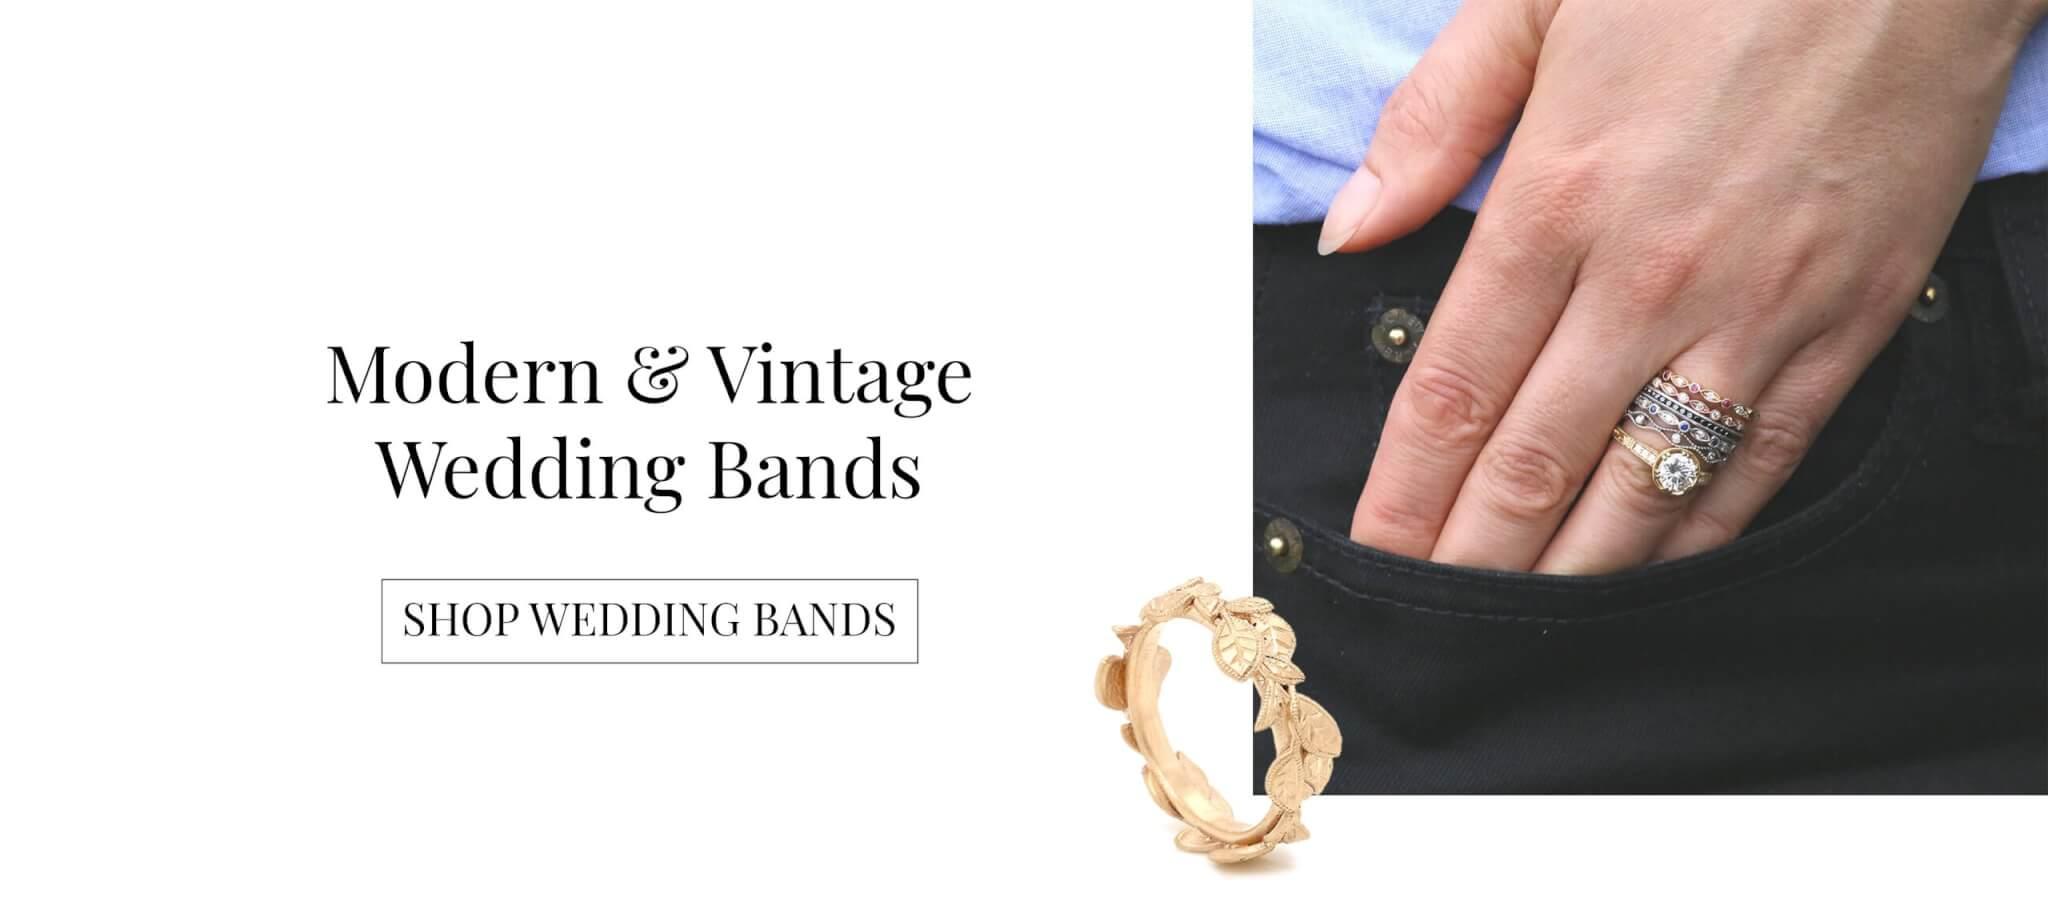 Modern & Vintage Wedding Bands, OroSpot, New York